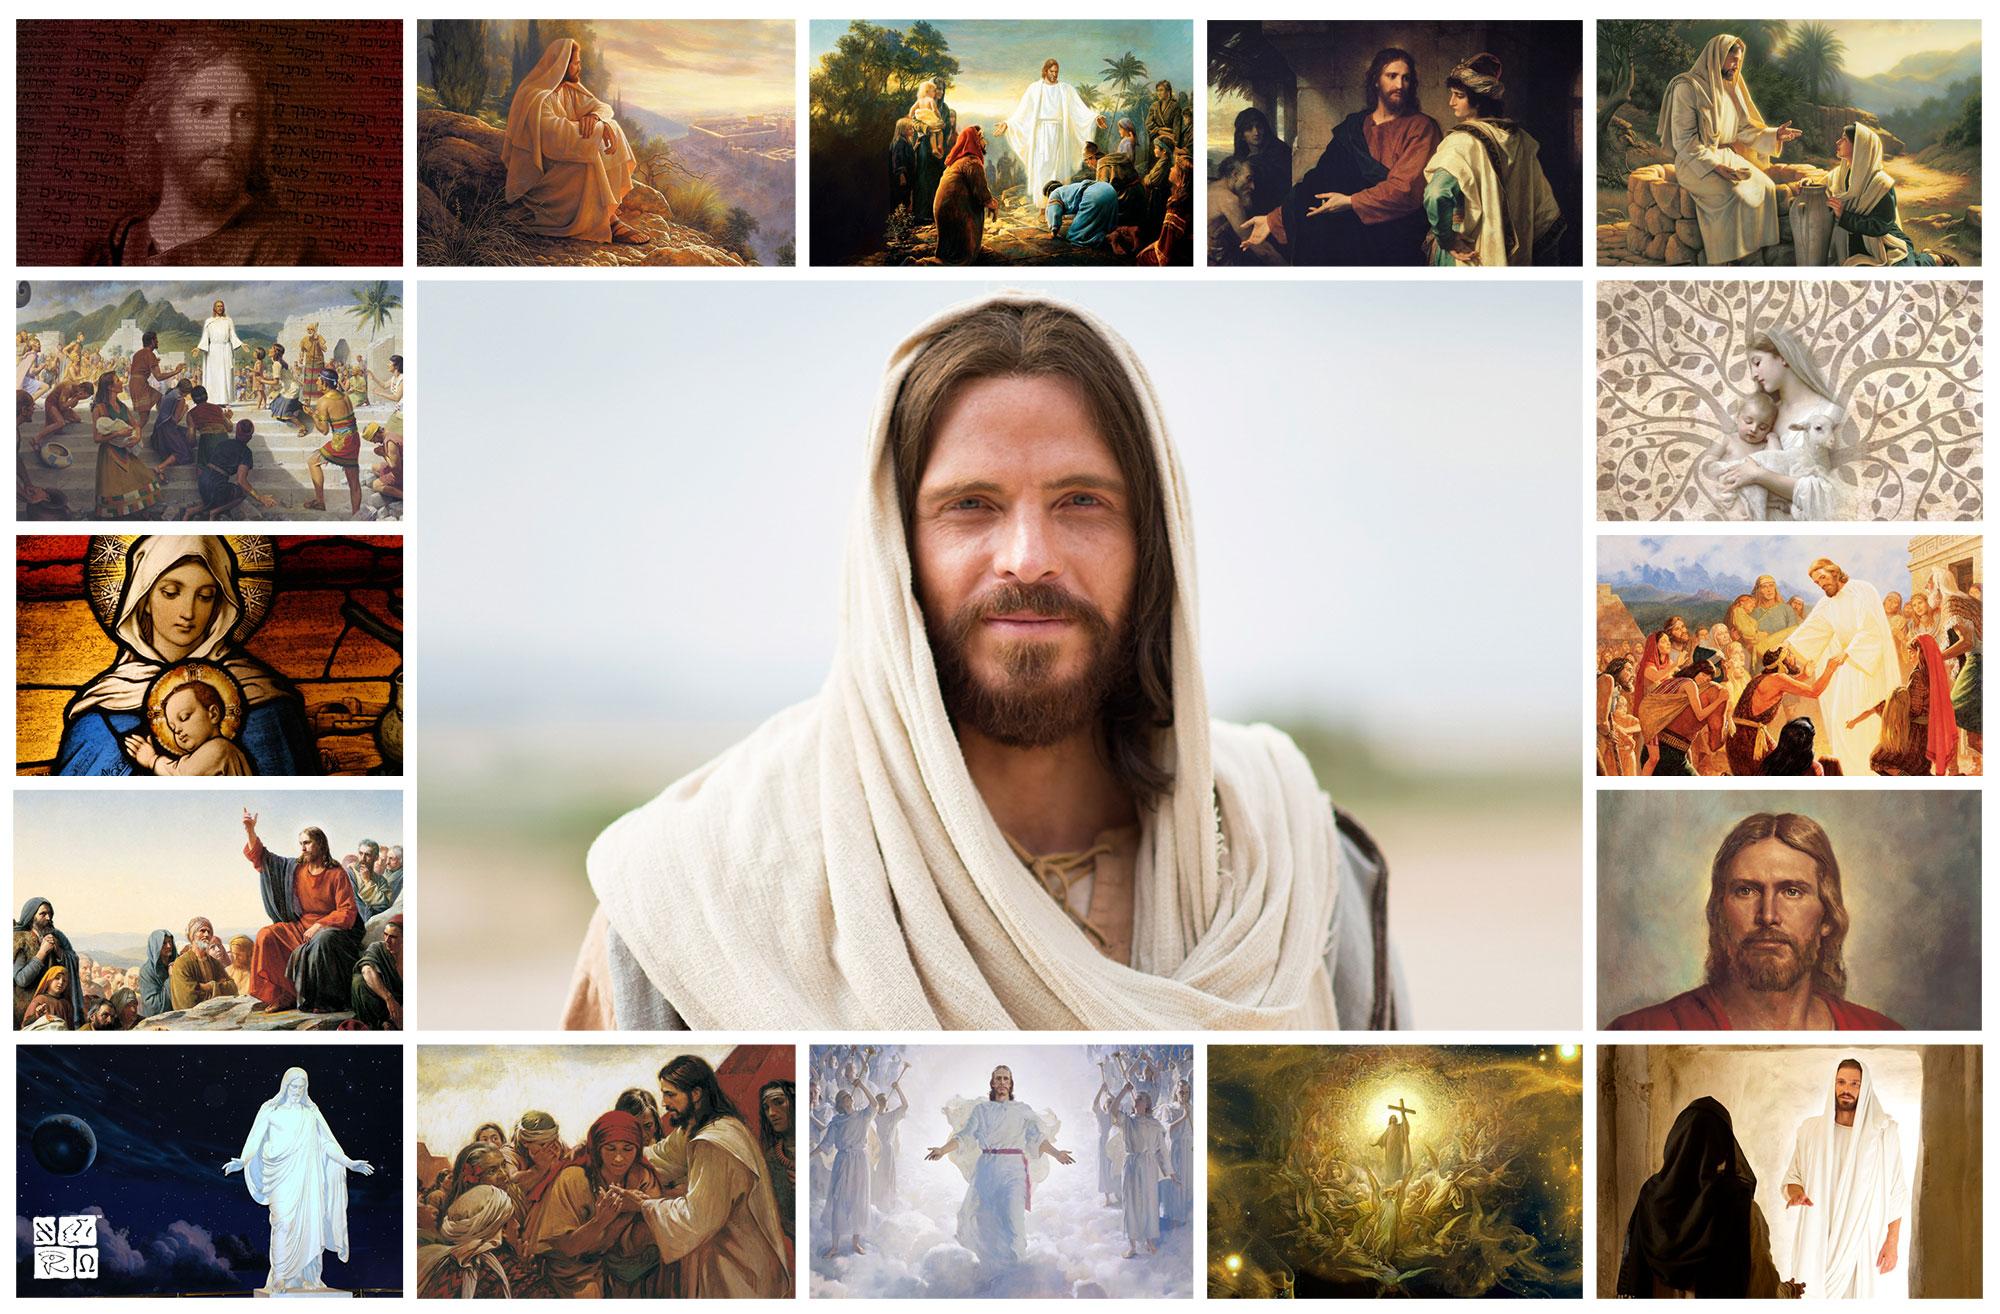 sumrak saga 5 deo online dating: dating christ's birth book of mormon